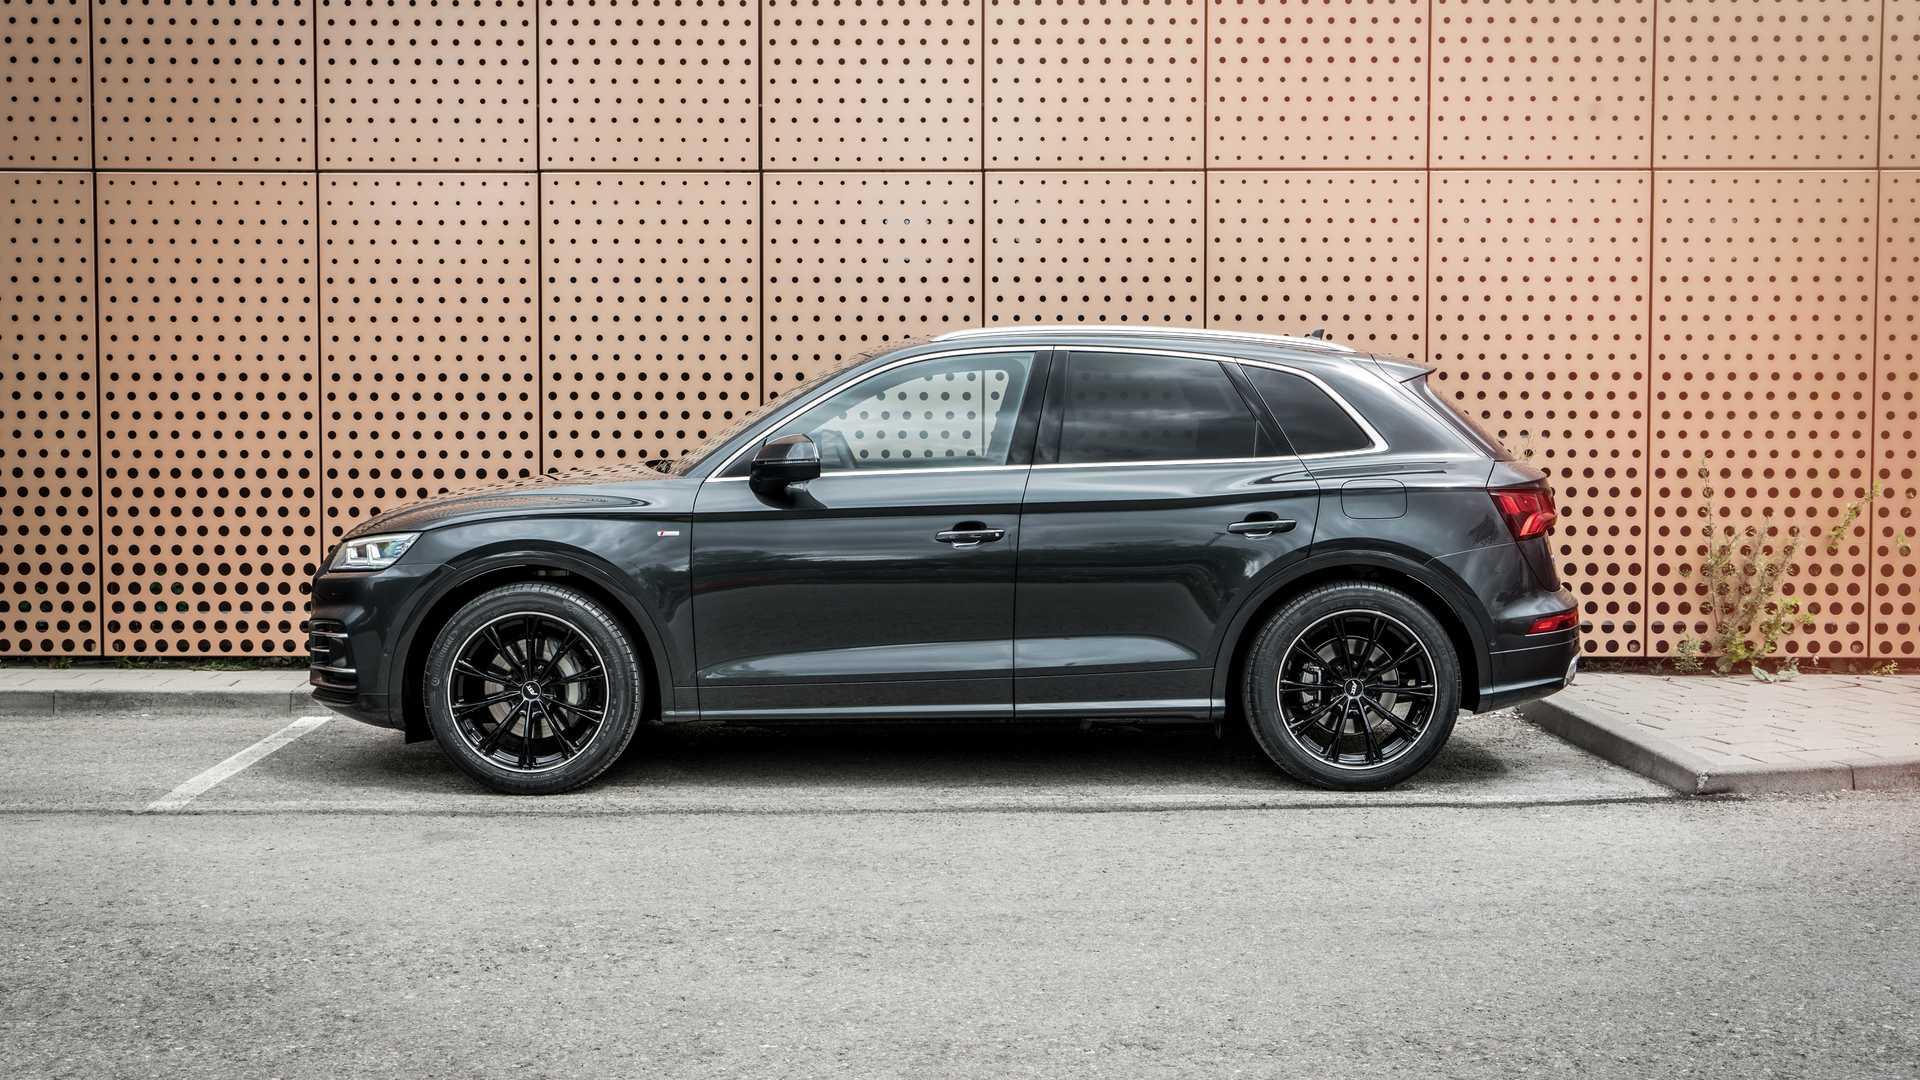 Audi Q5 TFSI e, o primeiro híbrido plug-in modificado pela ABT